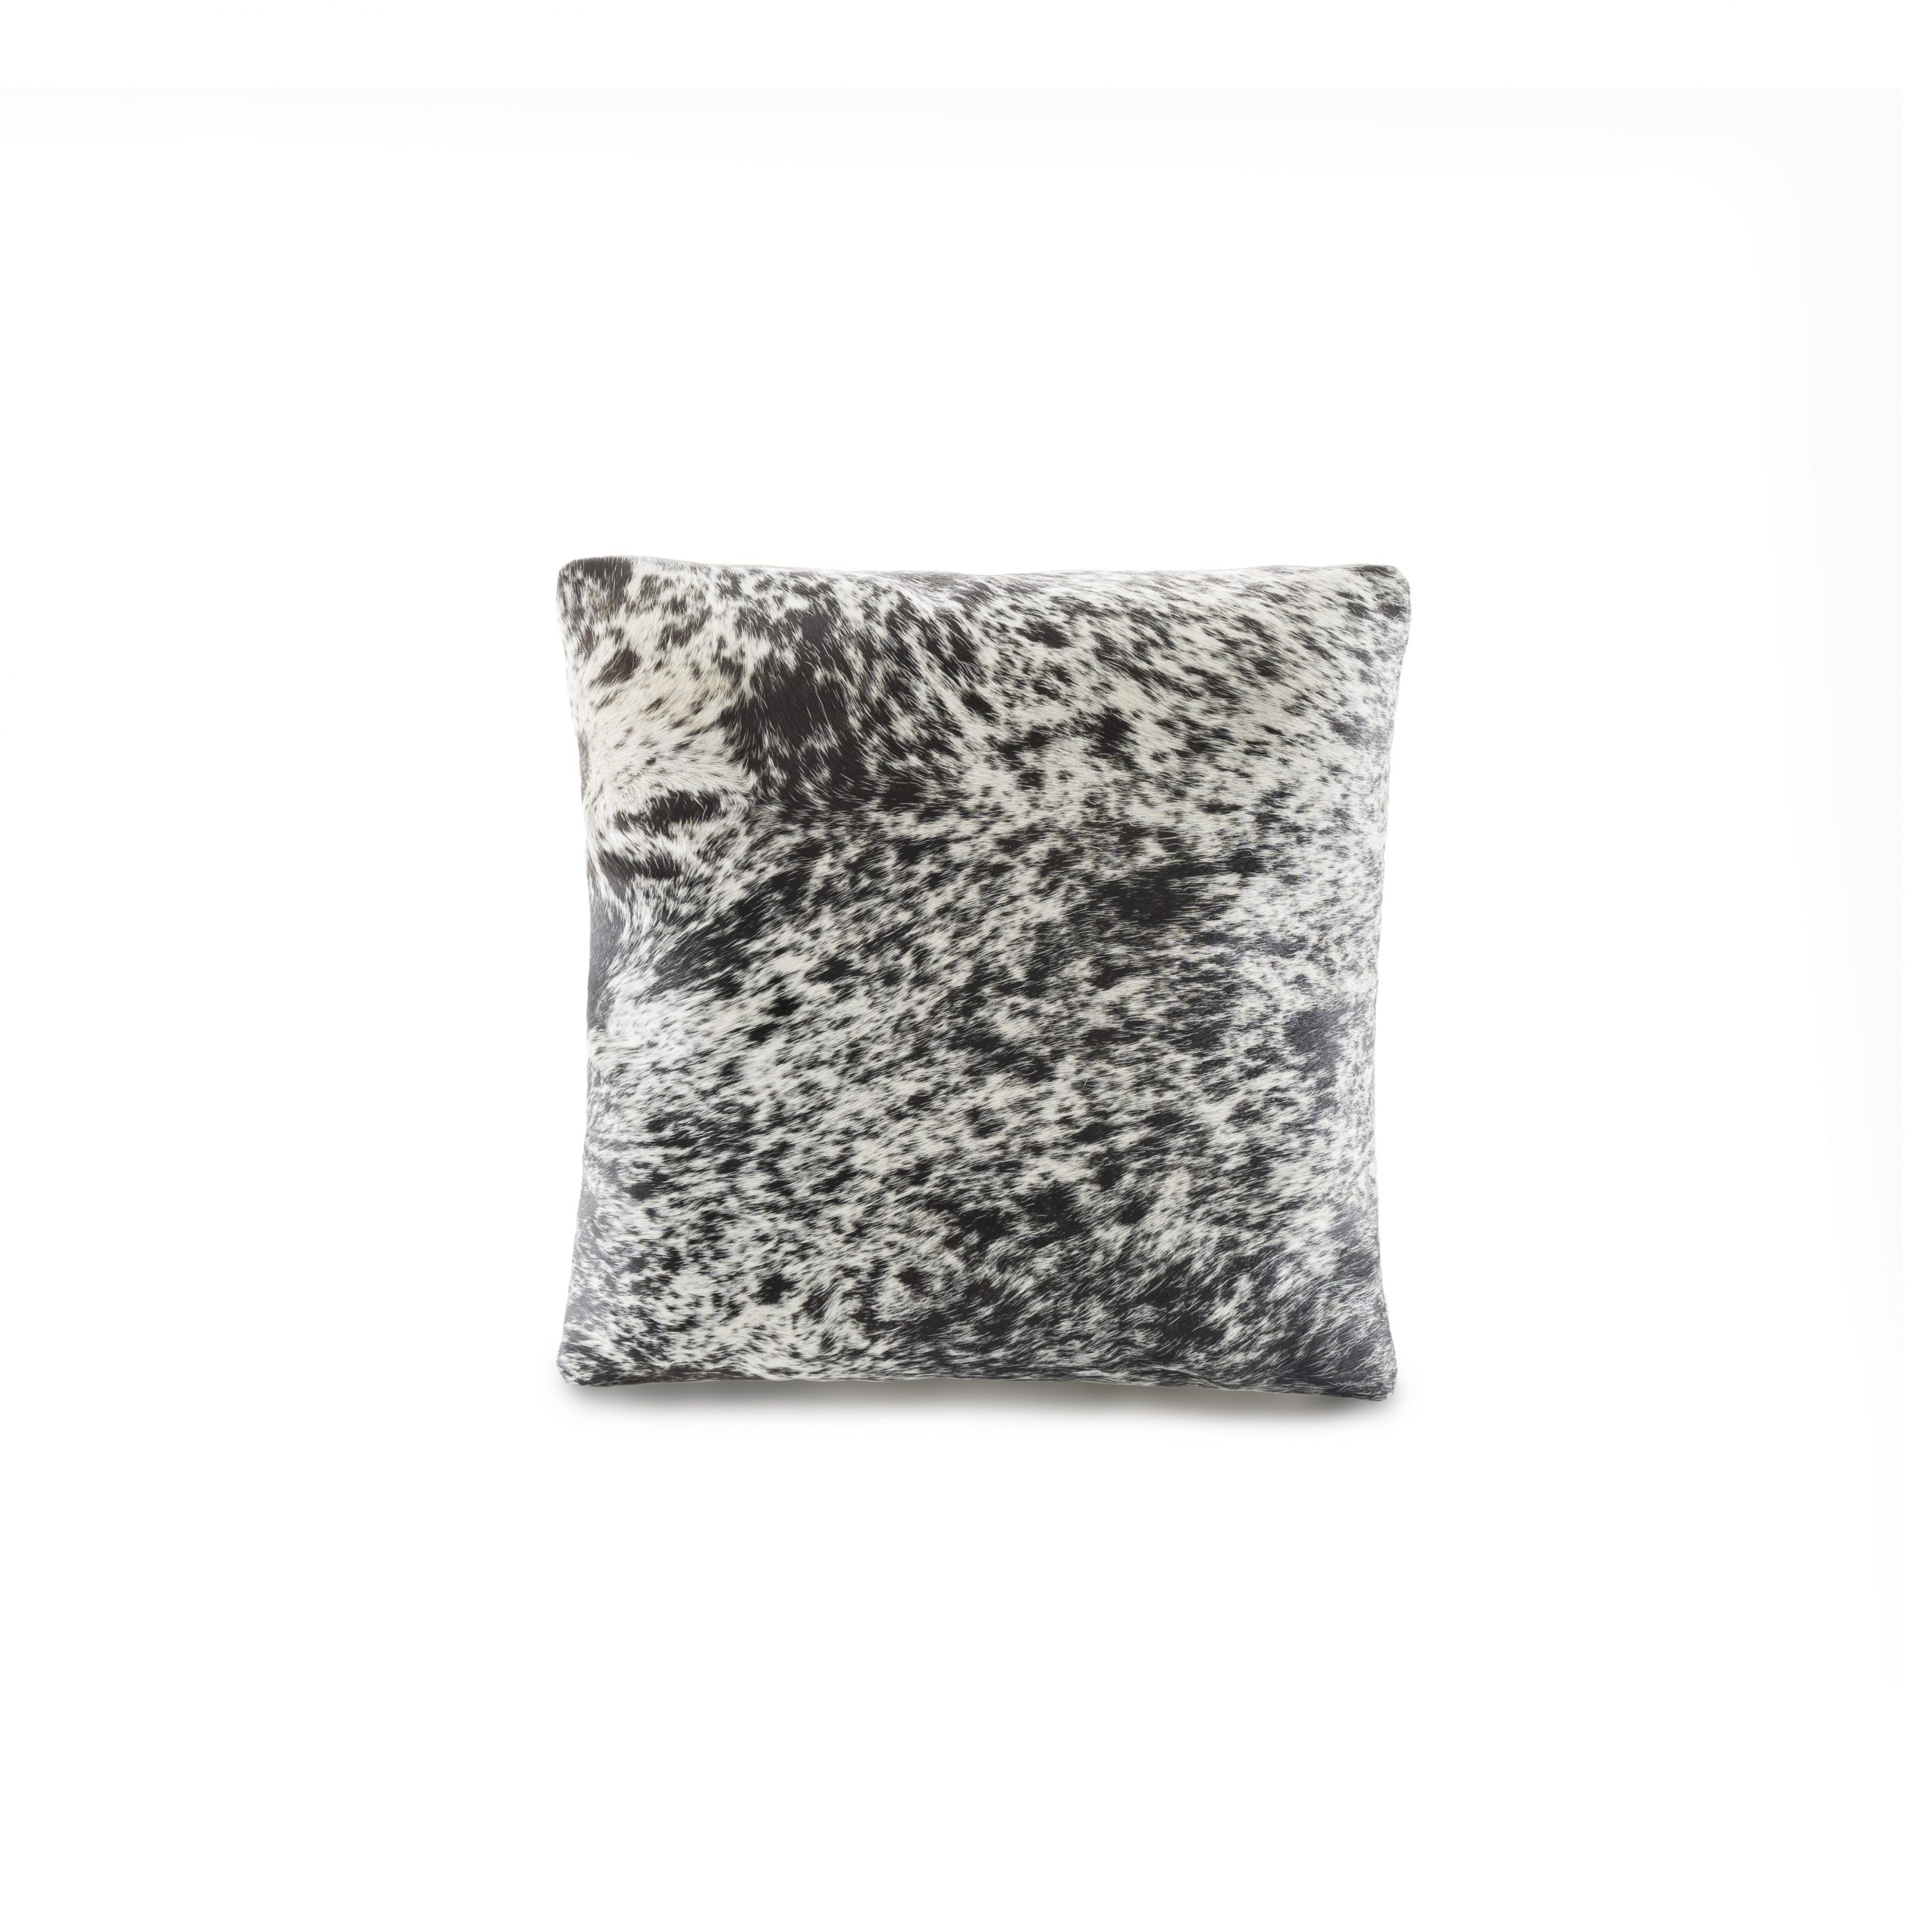 woola-cow-cushion-exotic-square